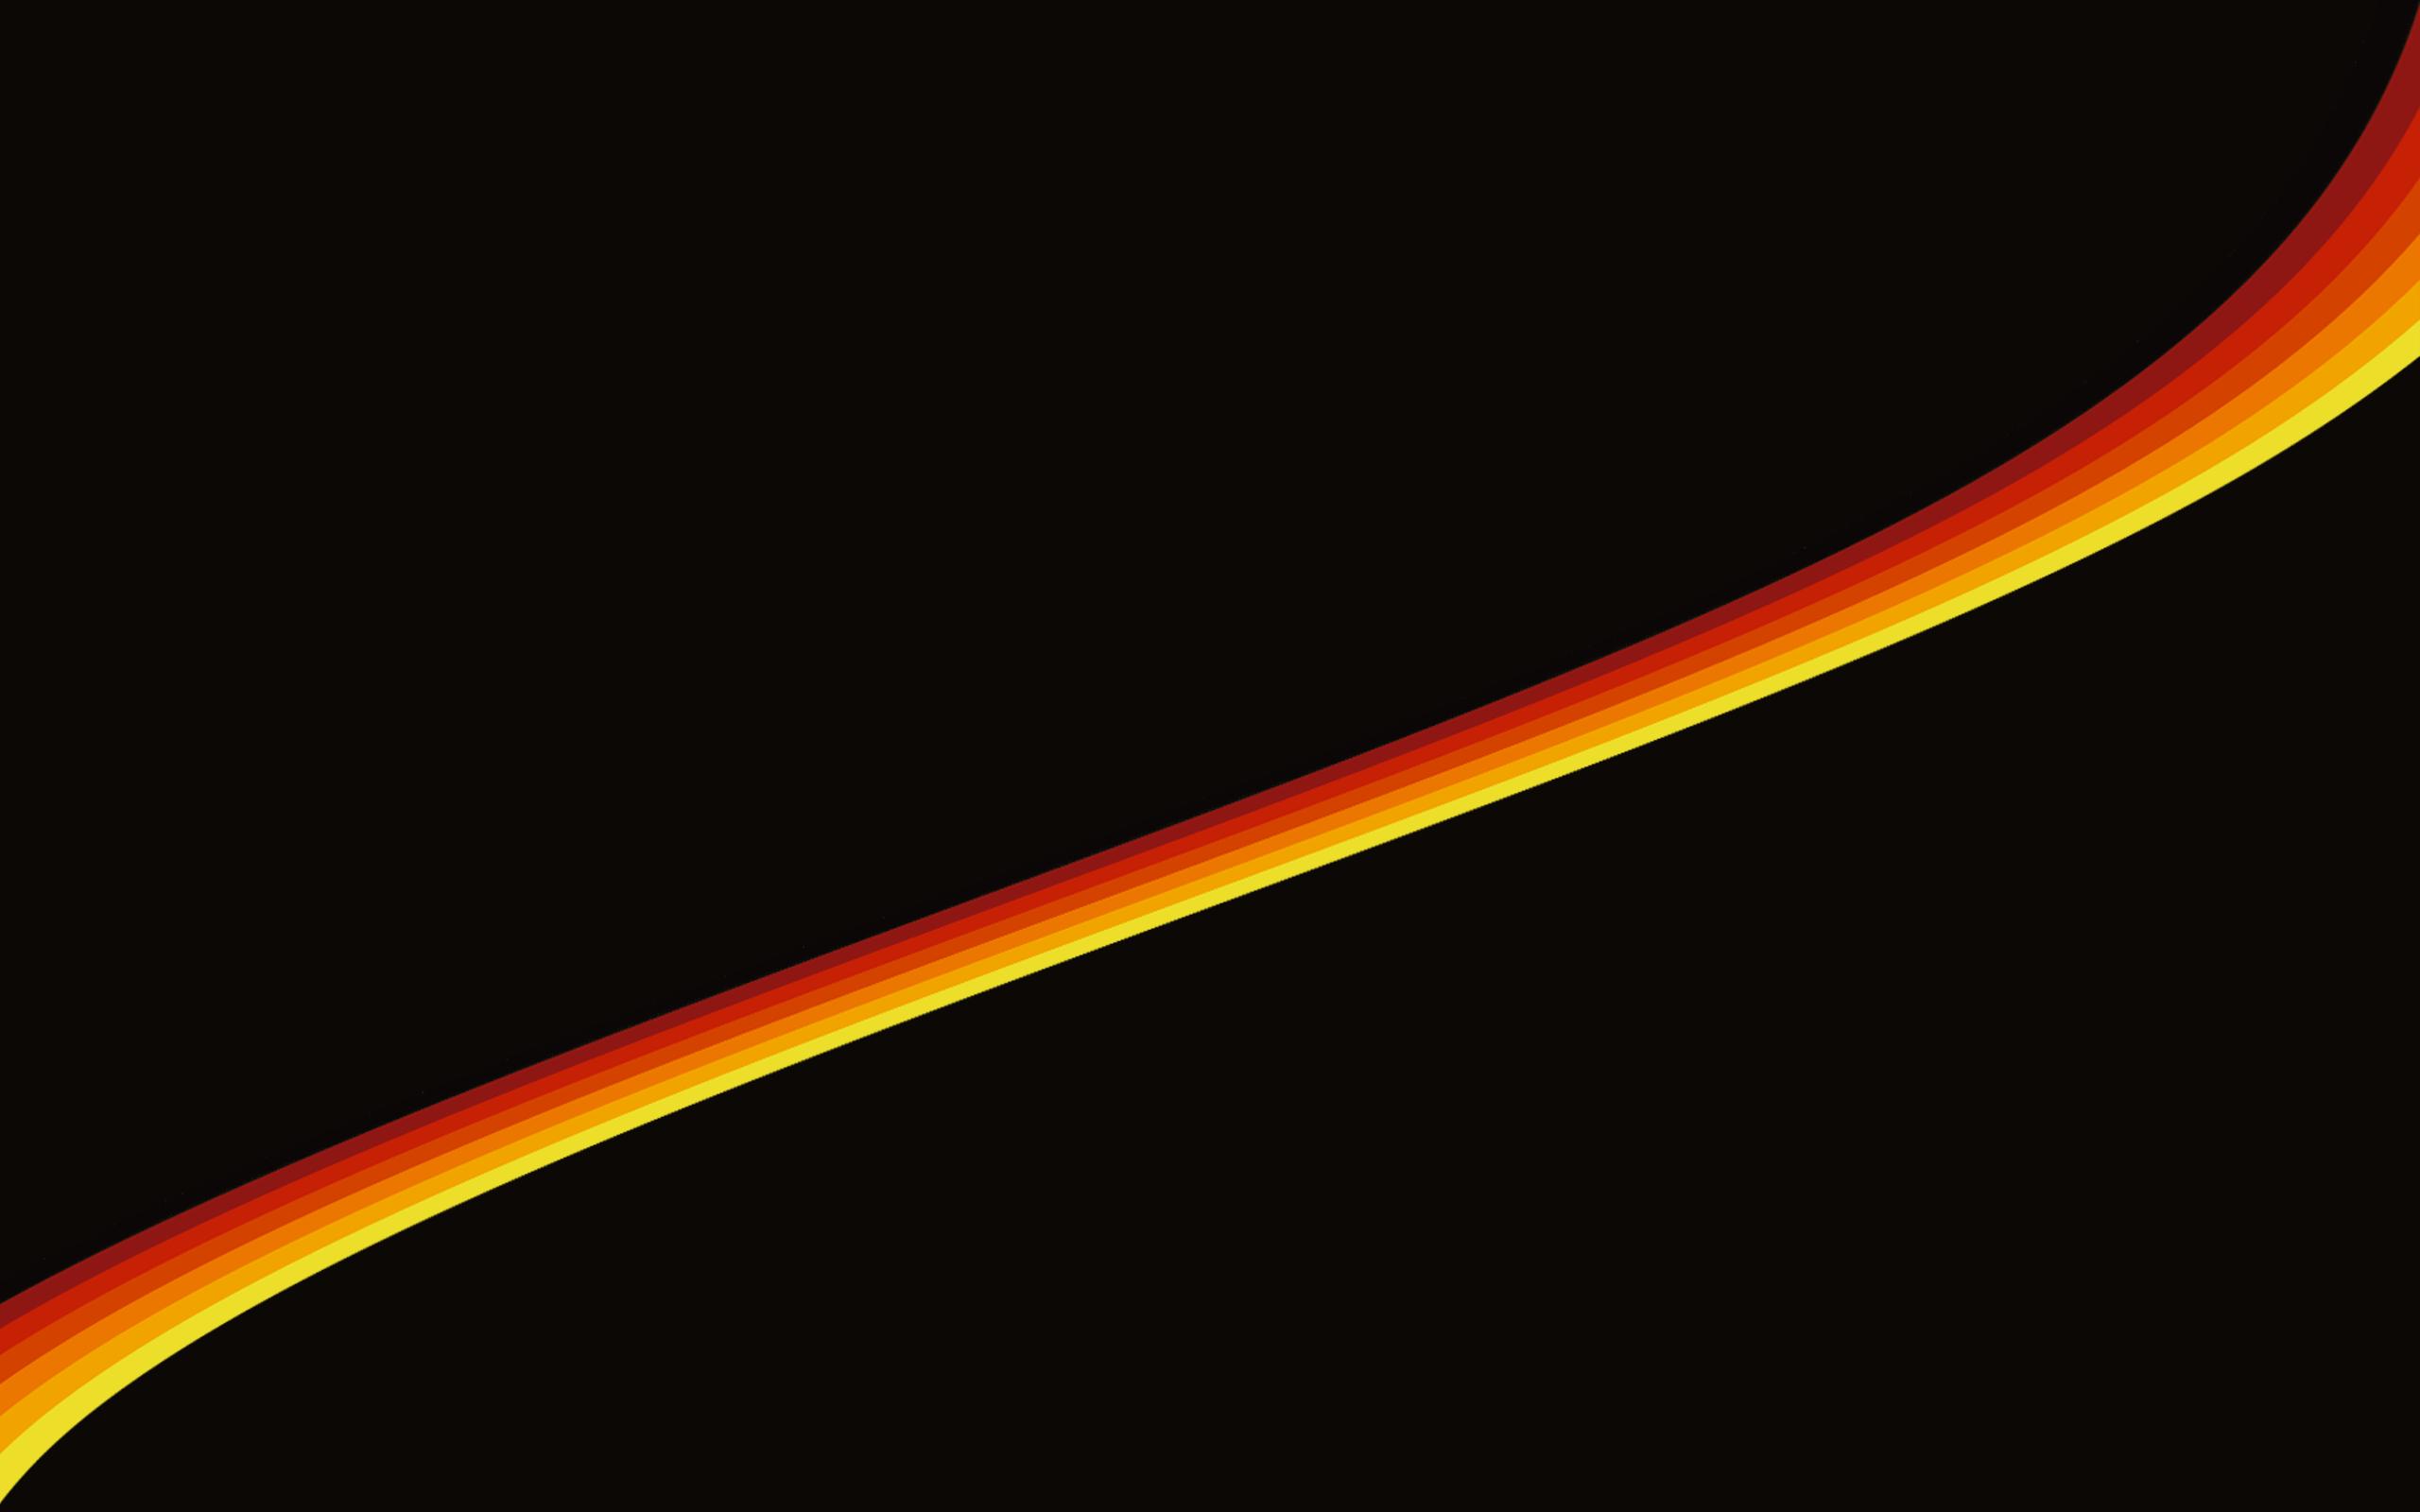 yellow orange ribbon diagonally black background